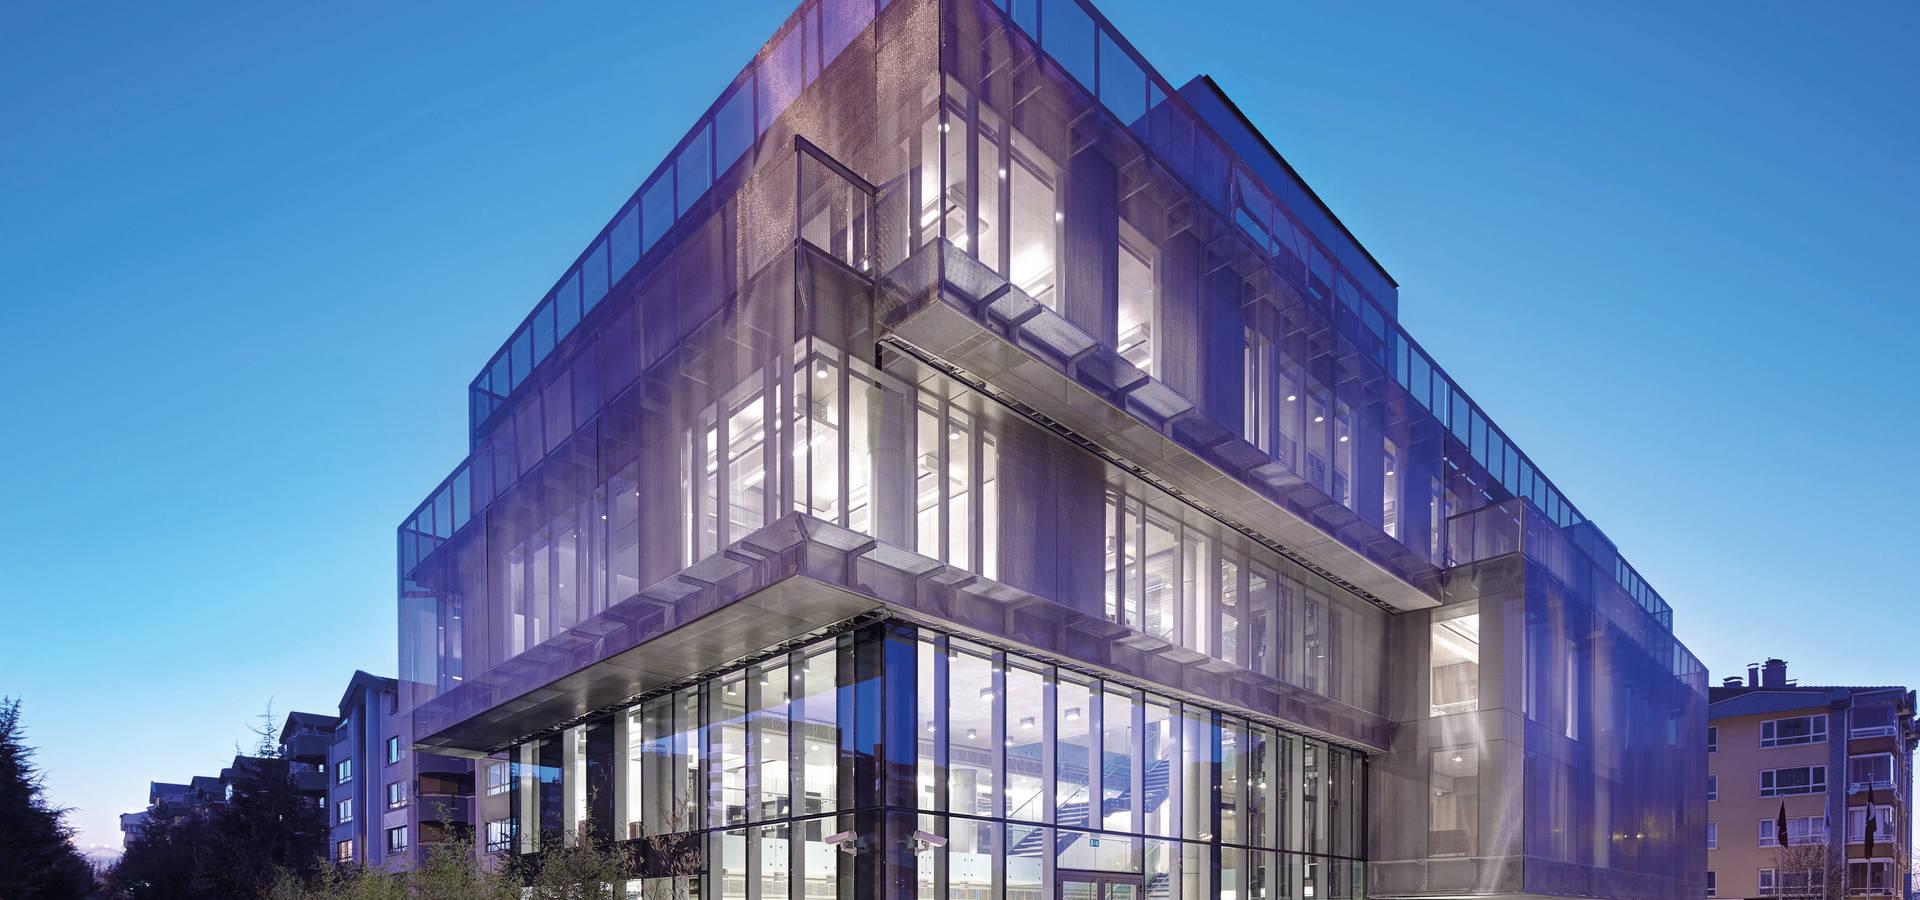 Avci Architects